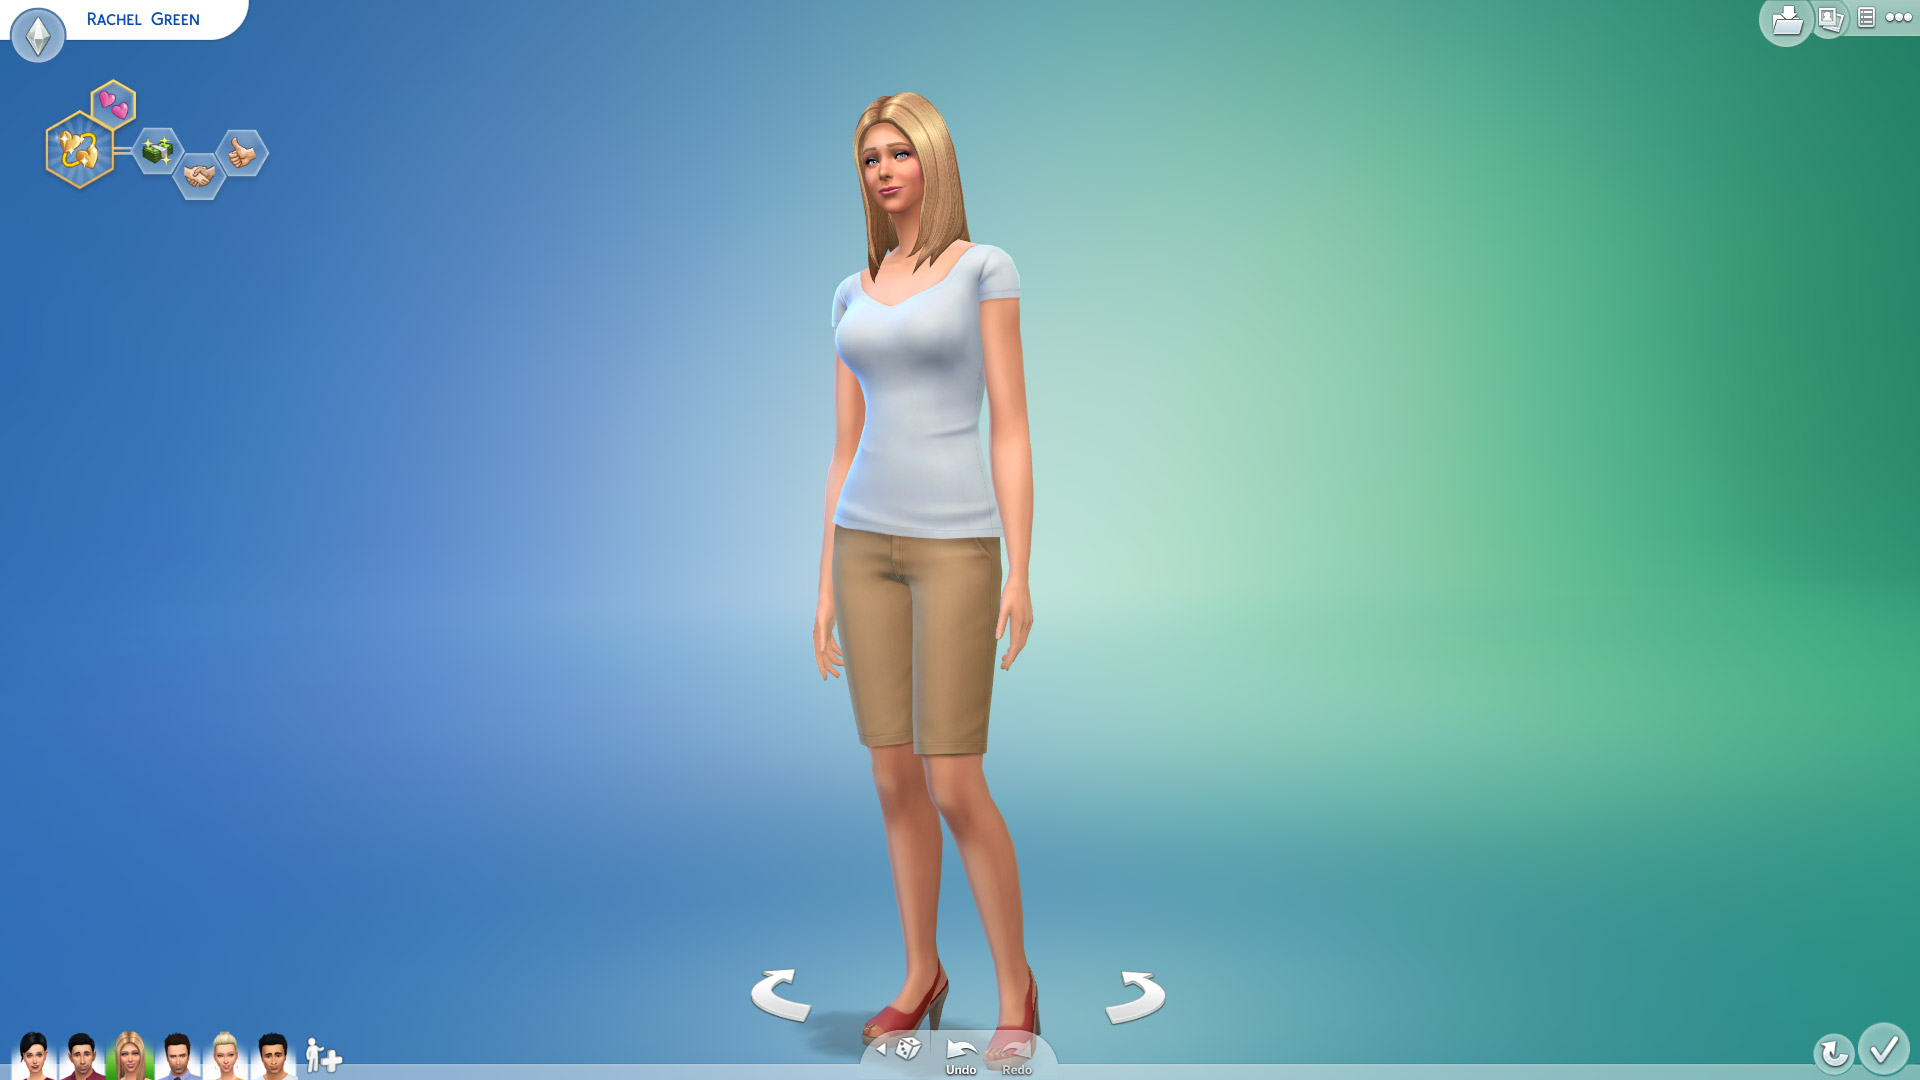 Rachel Green In Sims